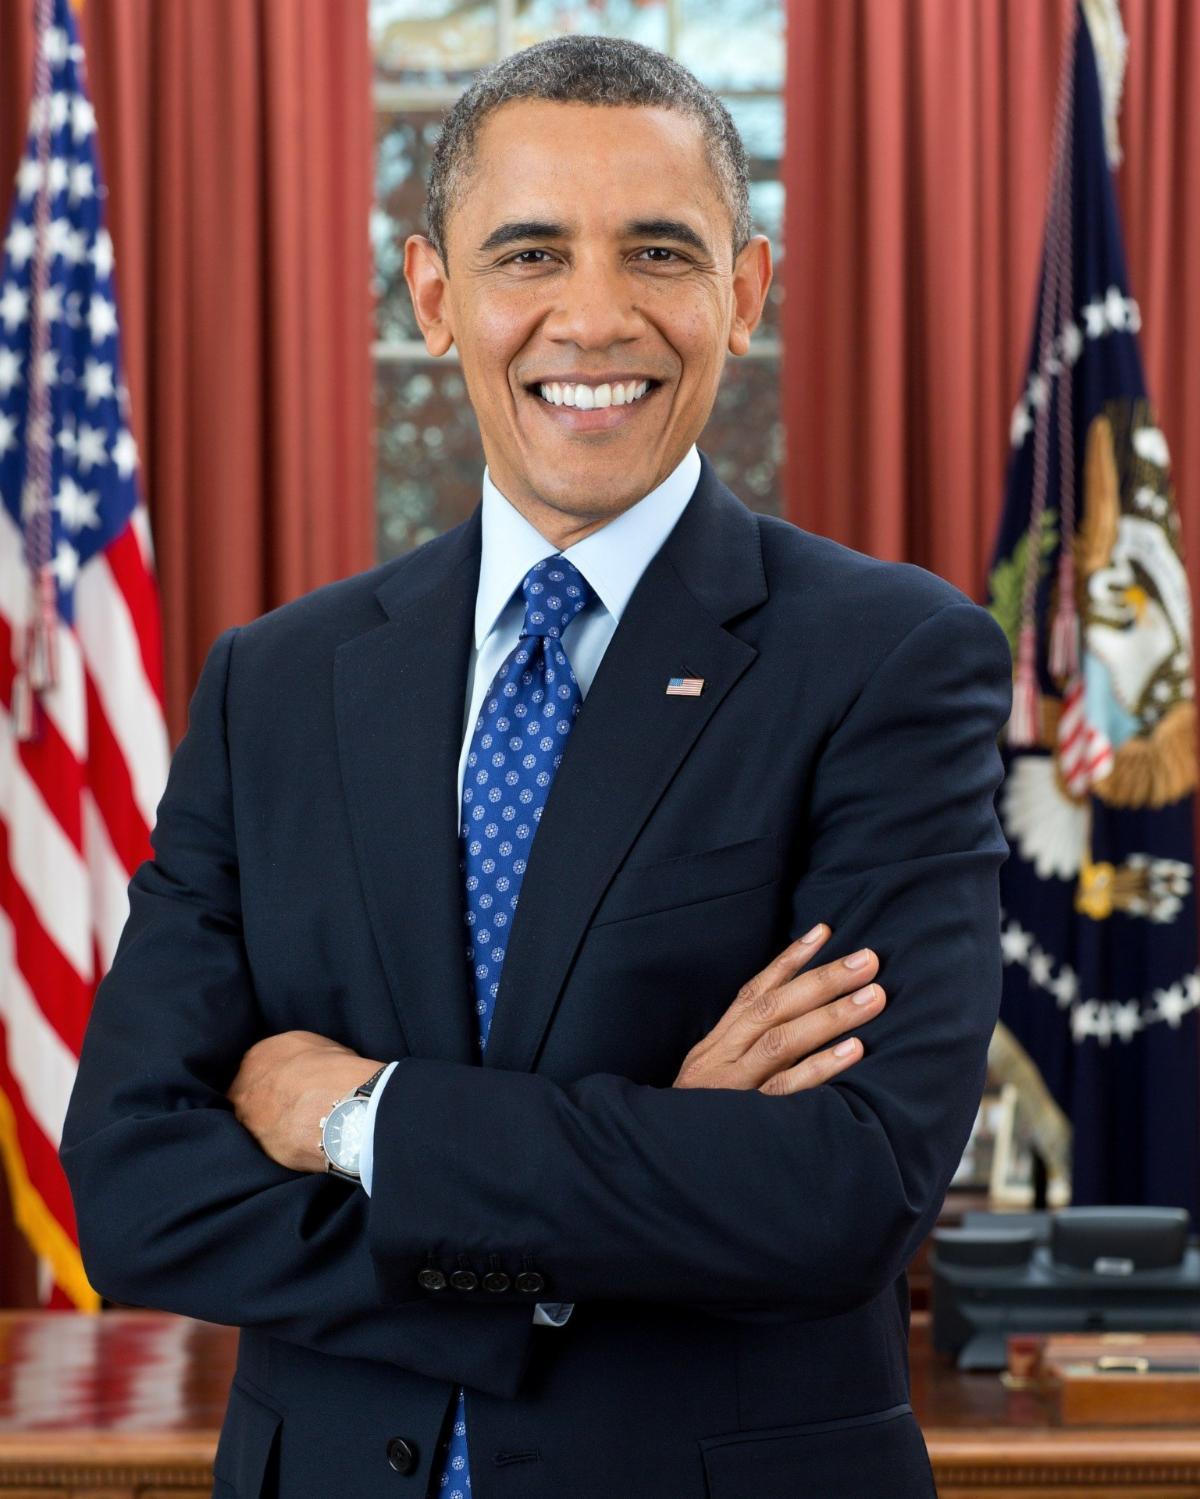 barack-obama-1129156_1920.jpg